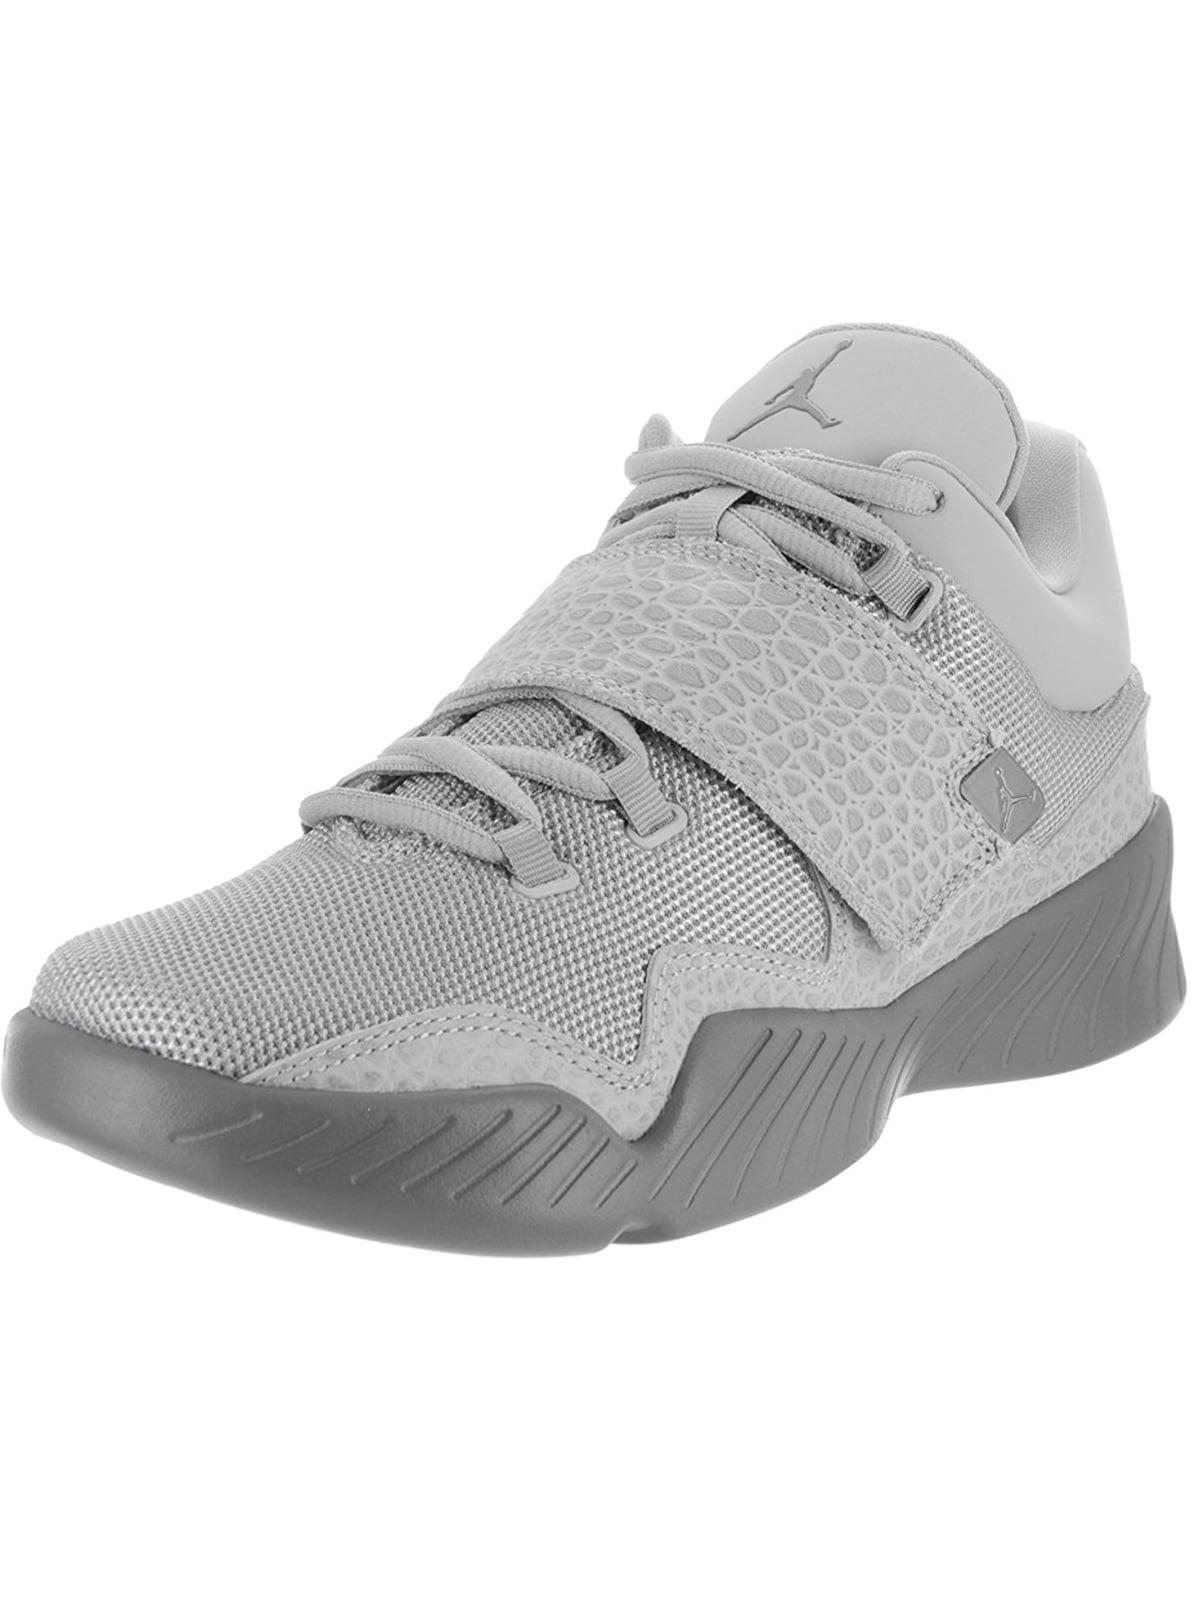 Nike Jordan Men's Jordan J23 Basketball Shoe